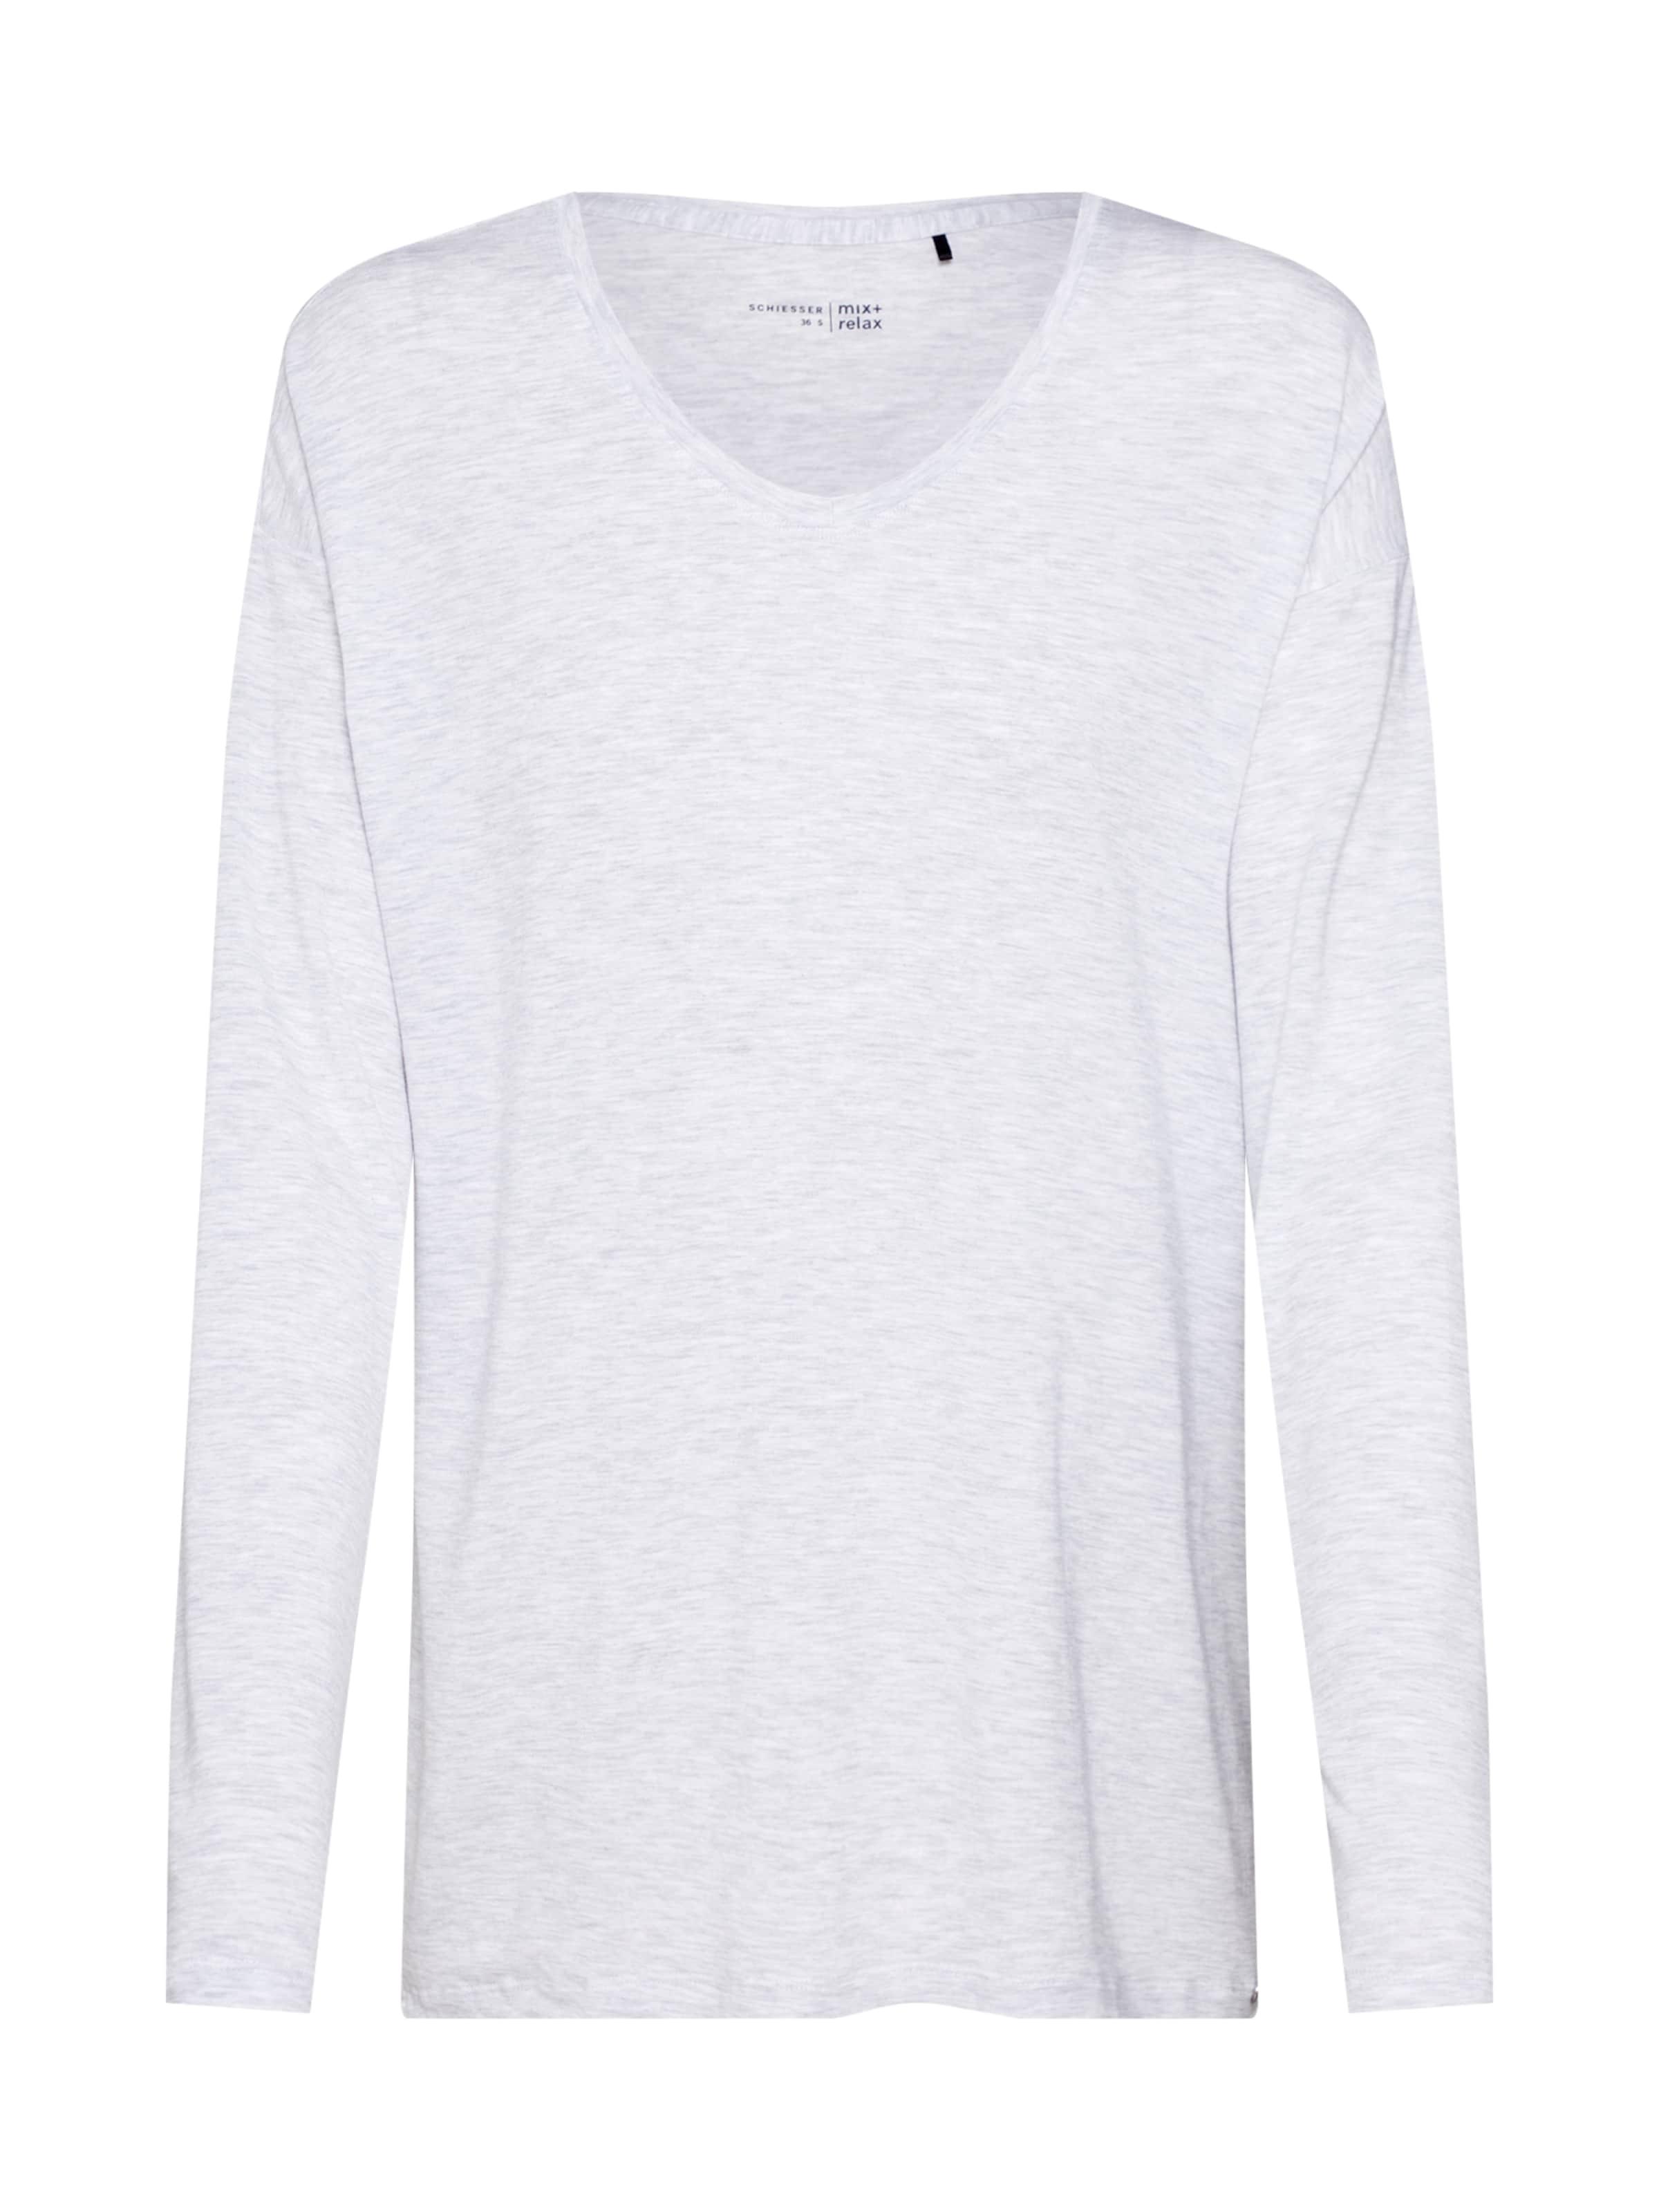 Graumeliert Shirt Schiesser Schiesser In Shirt L5jAq3R4